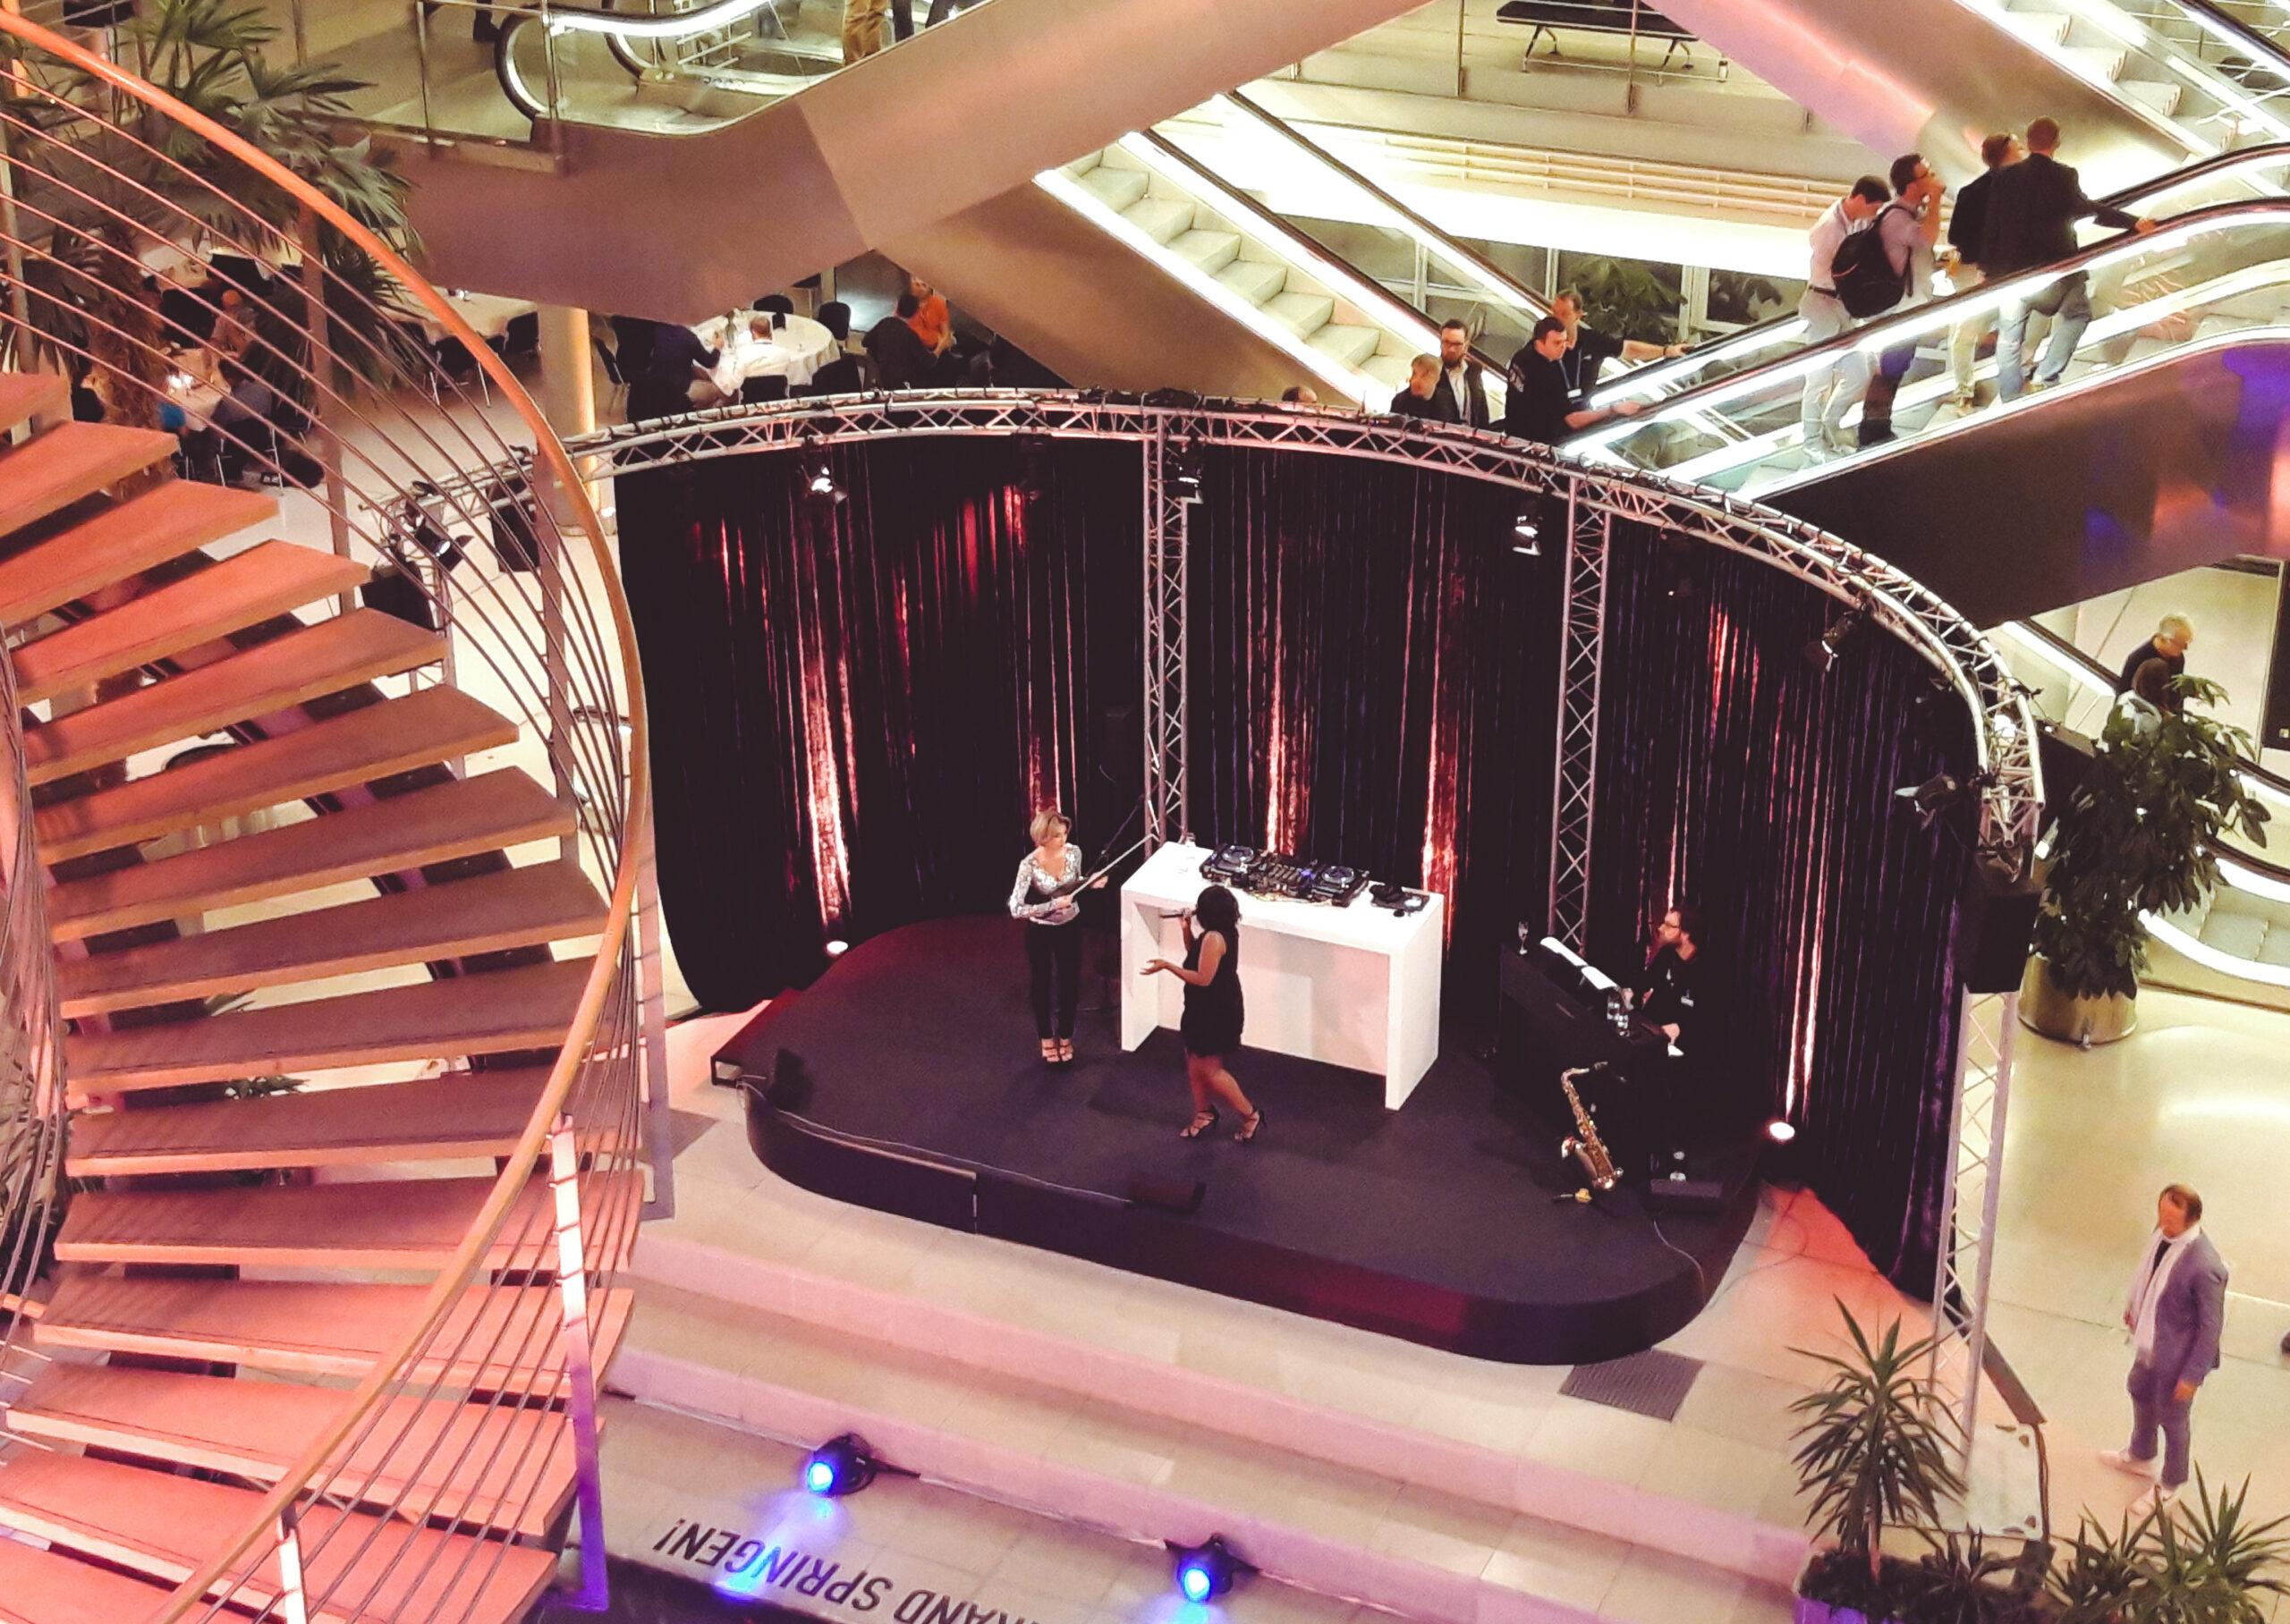 Messe-Leipzig-DPK18-Microsoft-Halle-Abendveranstaltung-MS Gold Partner synalis